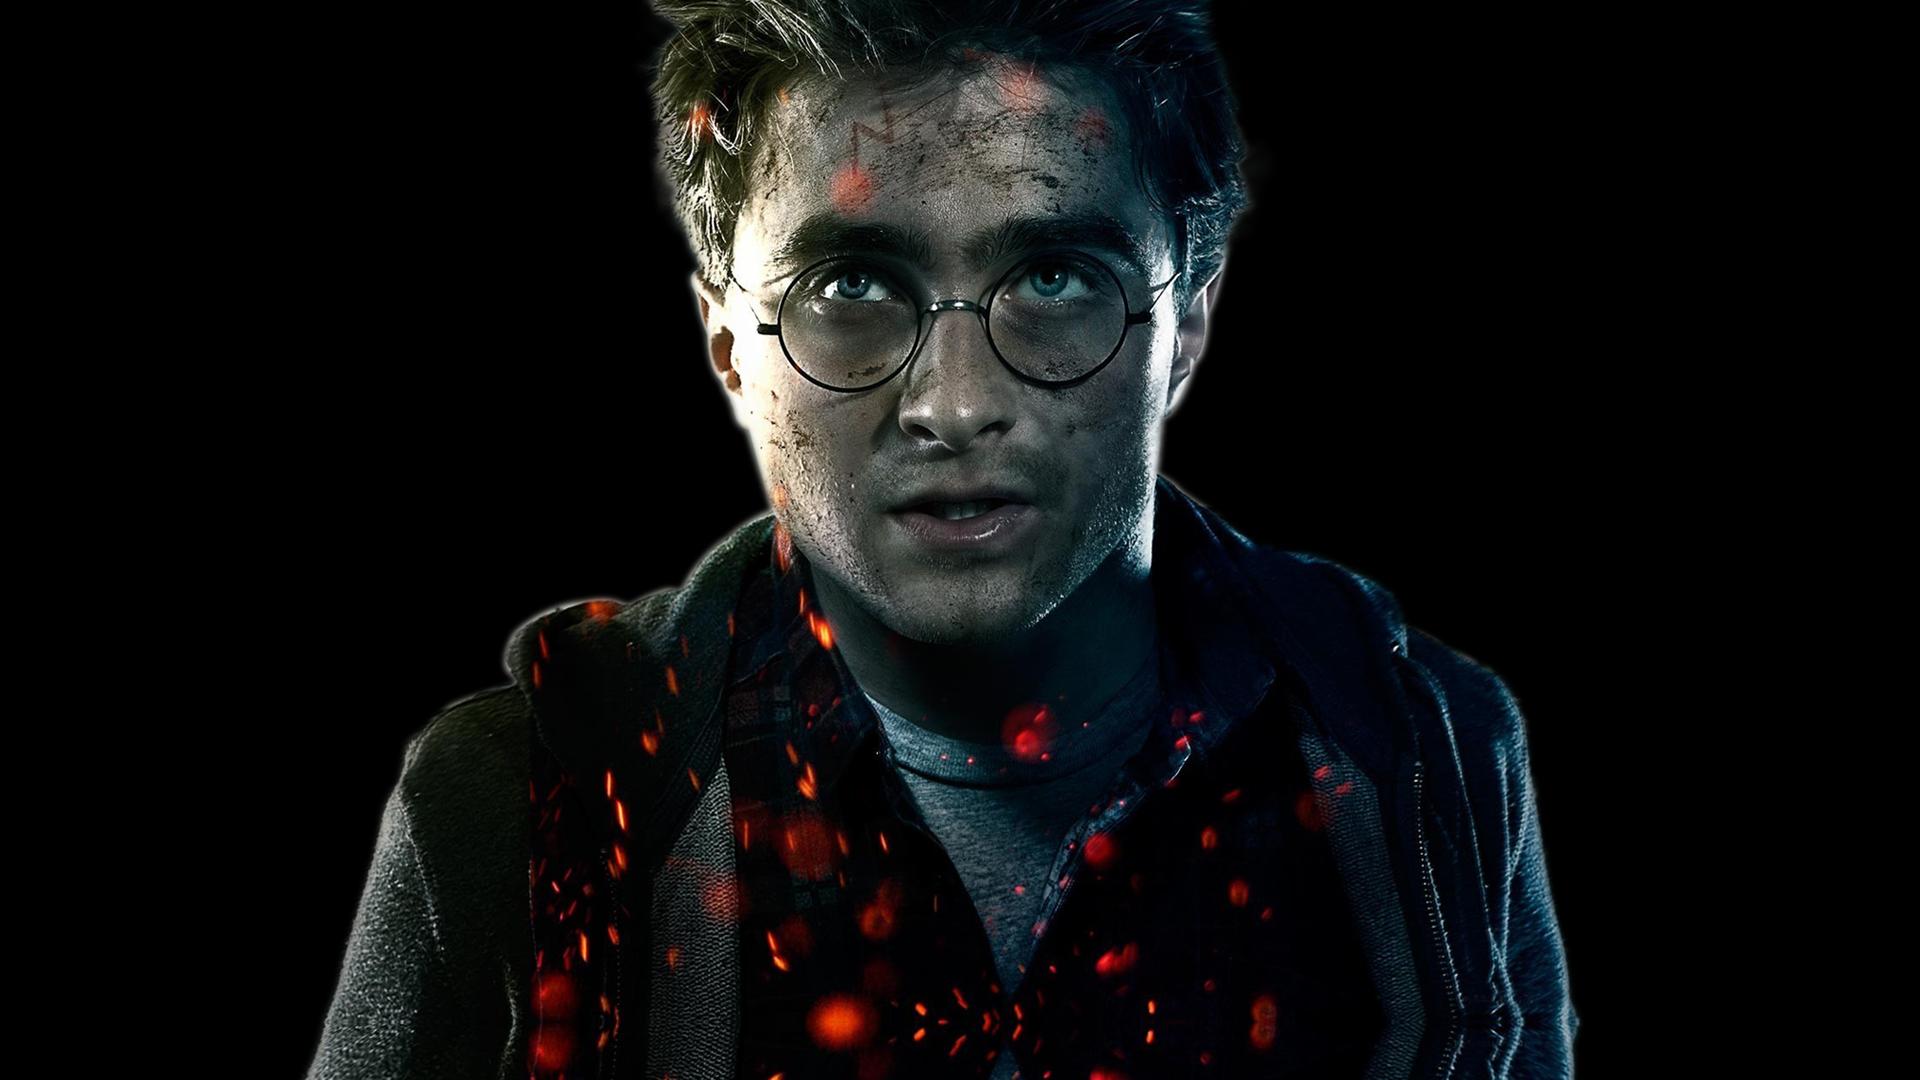 Voldemort Iphone Wallpaper Dessins En Couleurs 224 Imprimer Harry Potter Num 233 Ro 618082